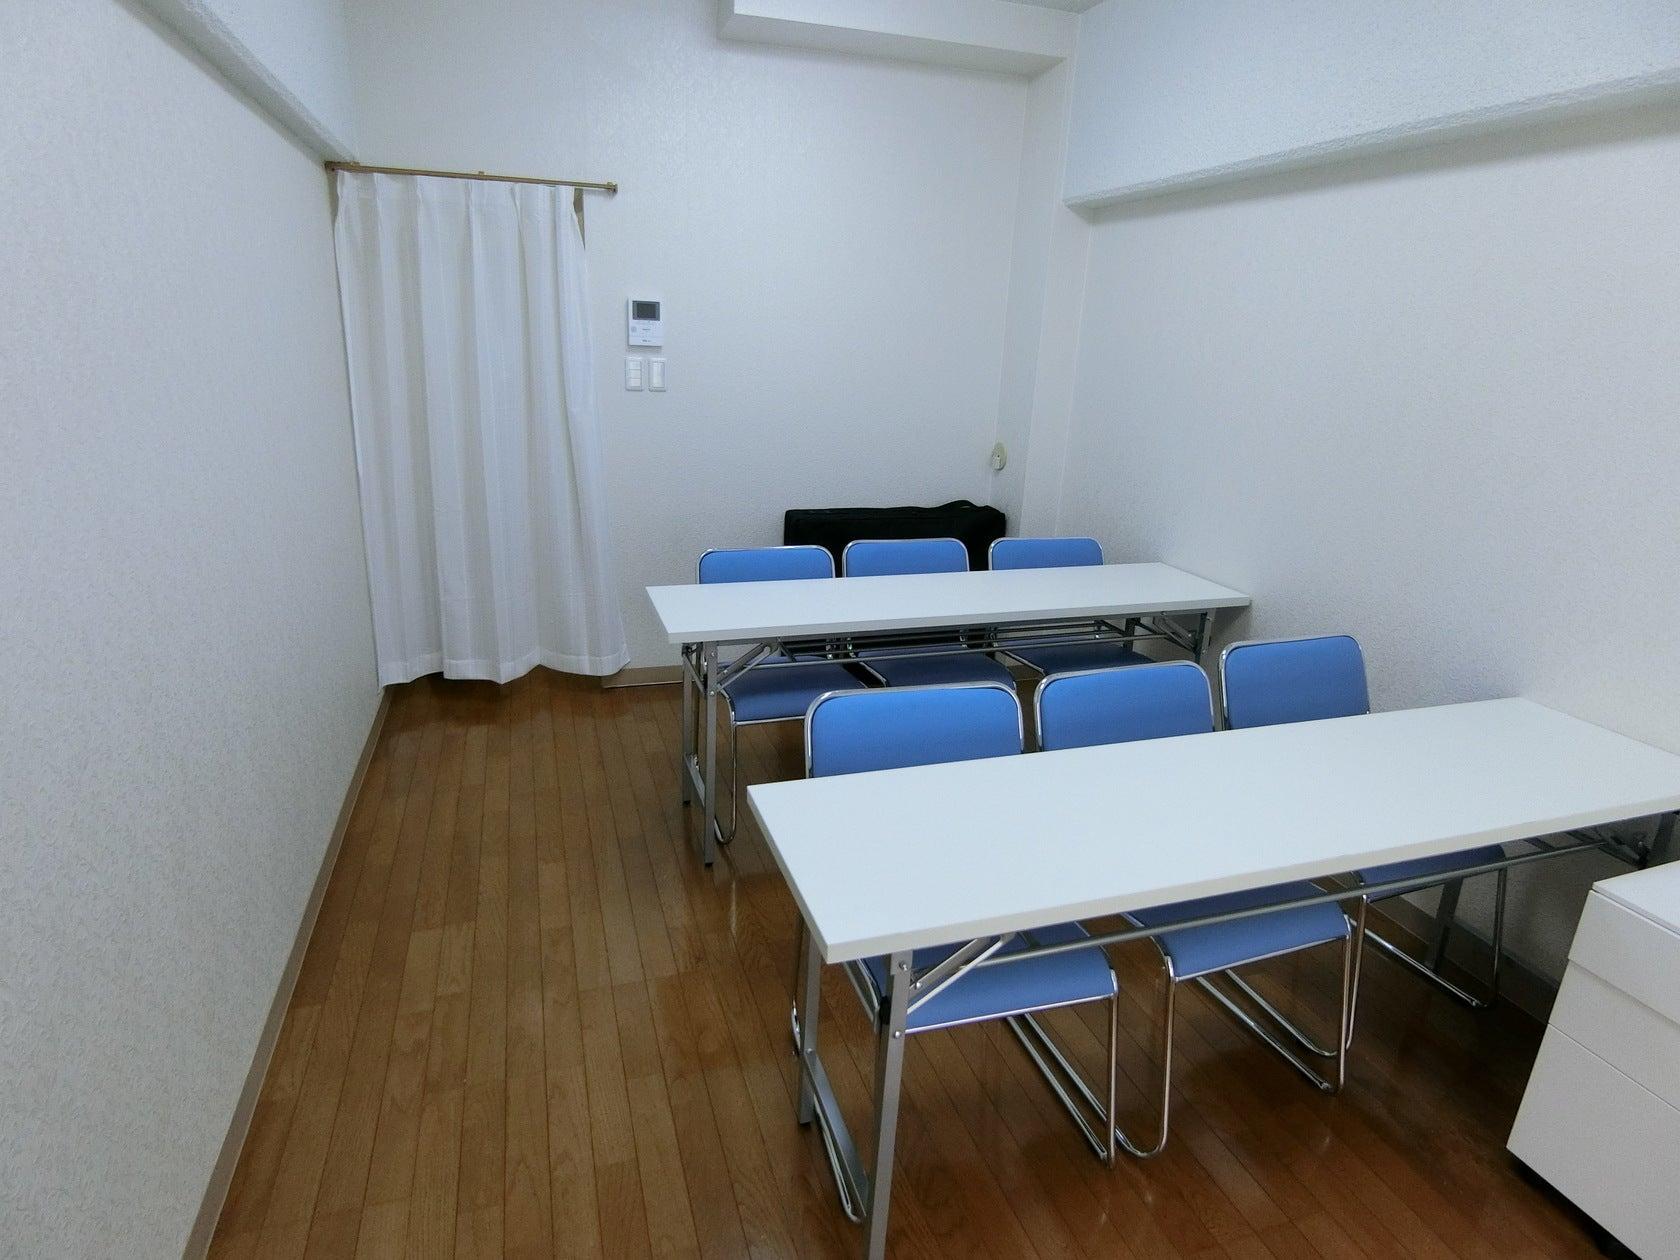 <ELFINセミナールーム>天神エリアに新規オープン♪ミニセミナー、勉強会等にご活用ください。